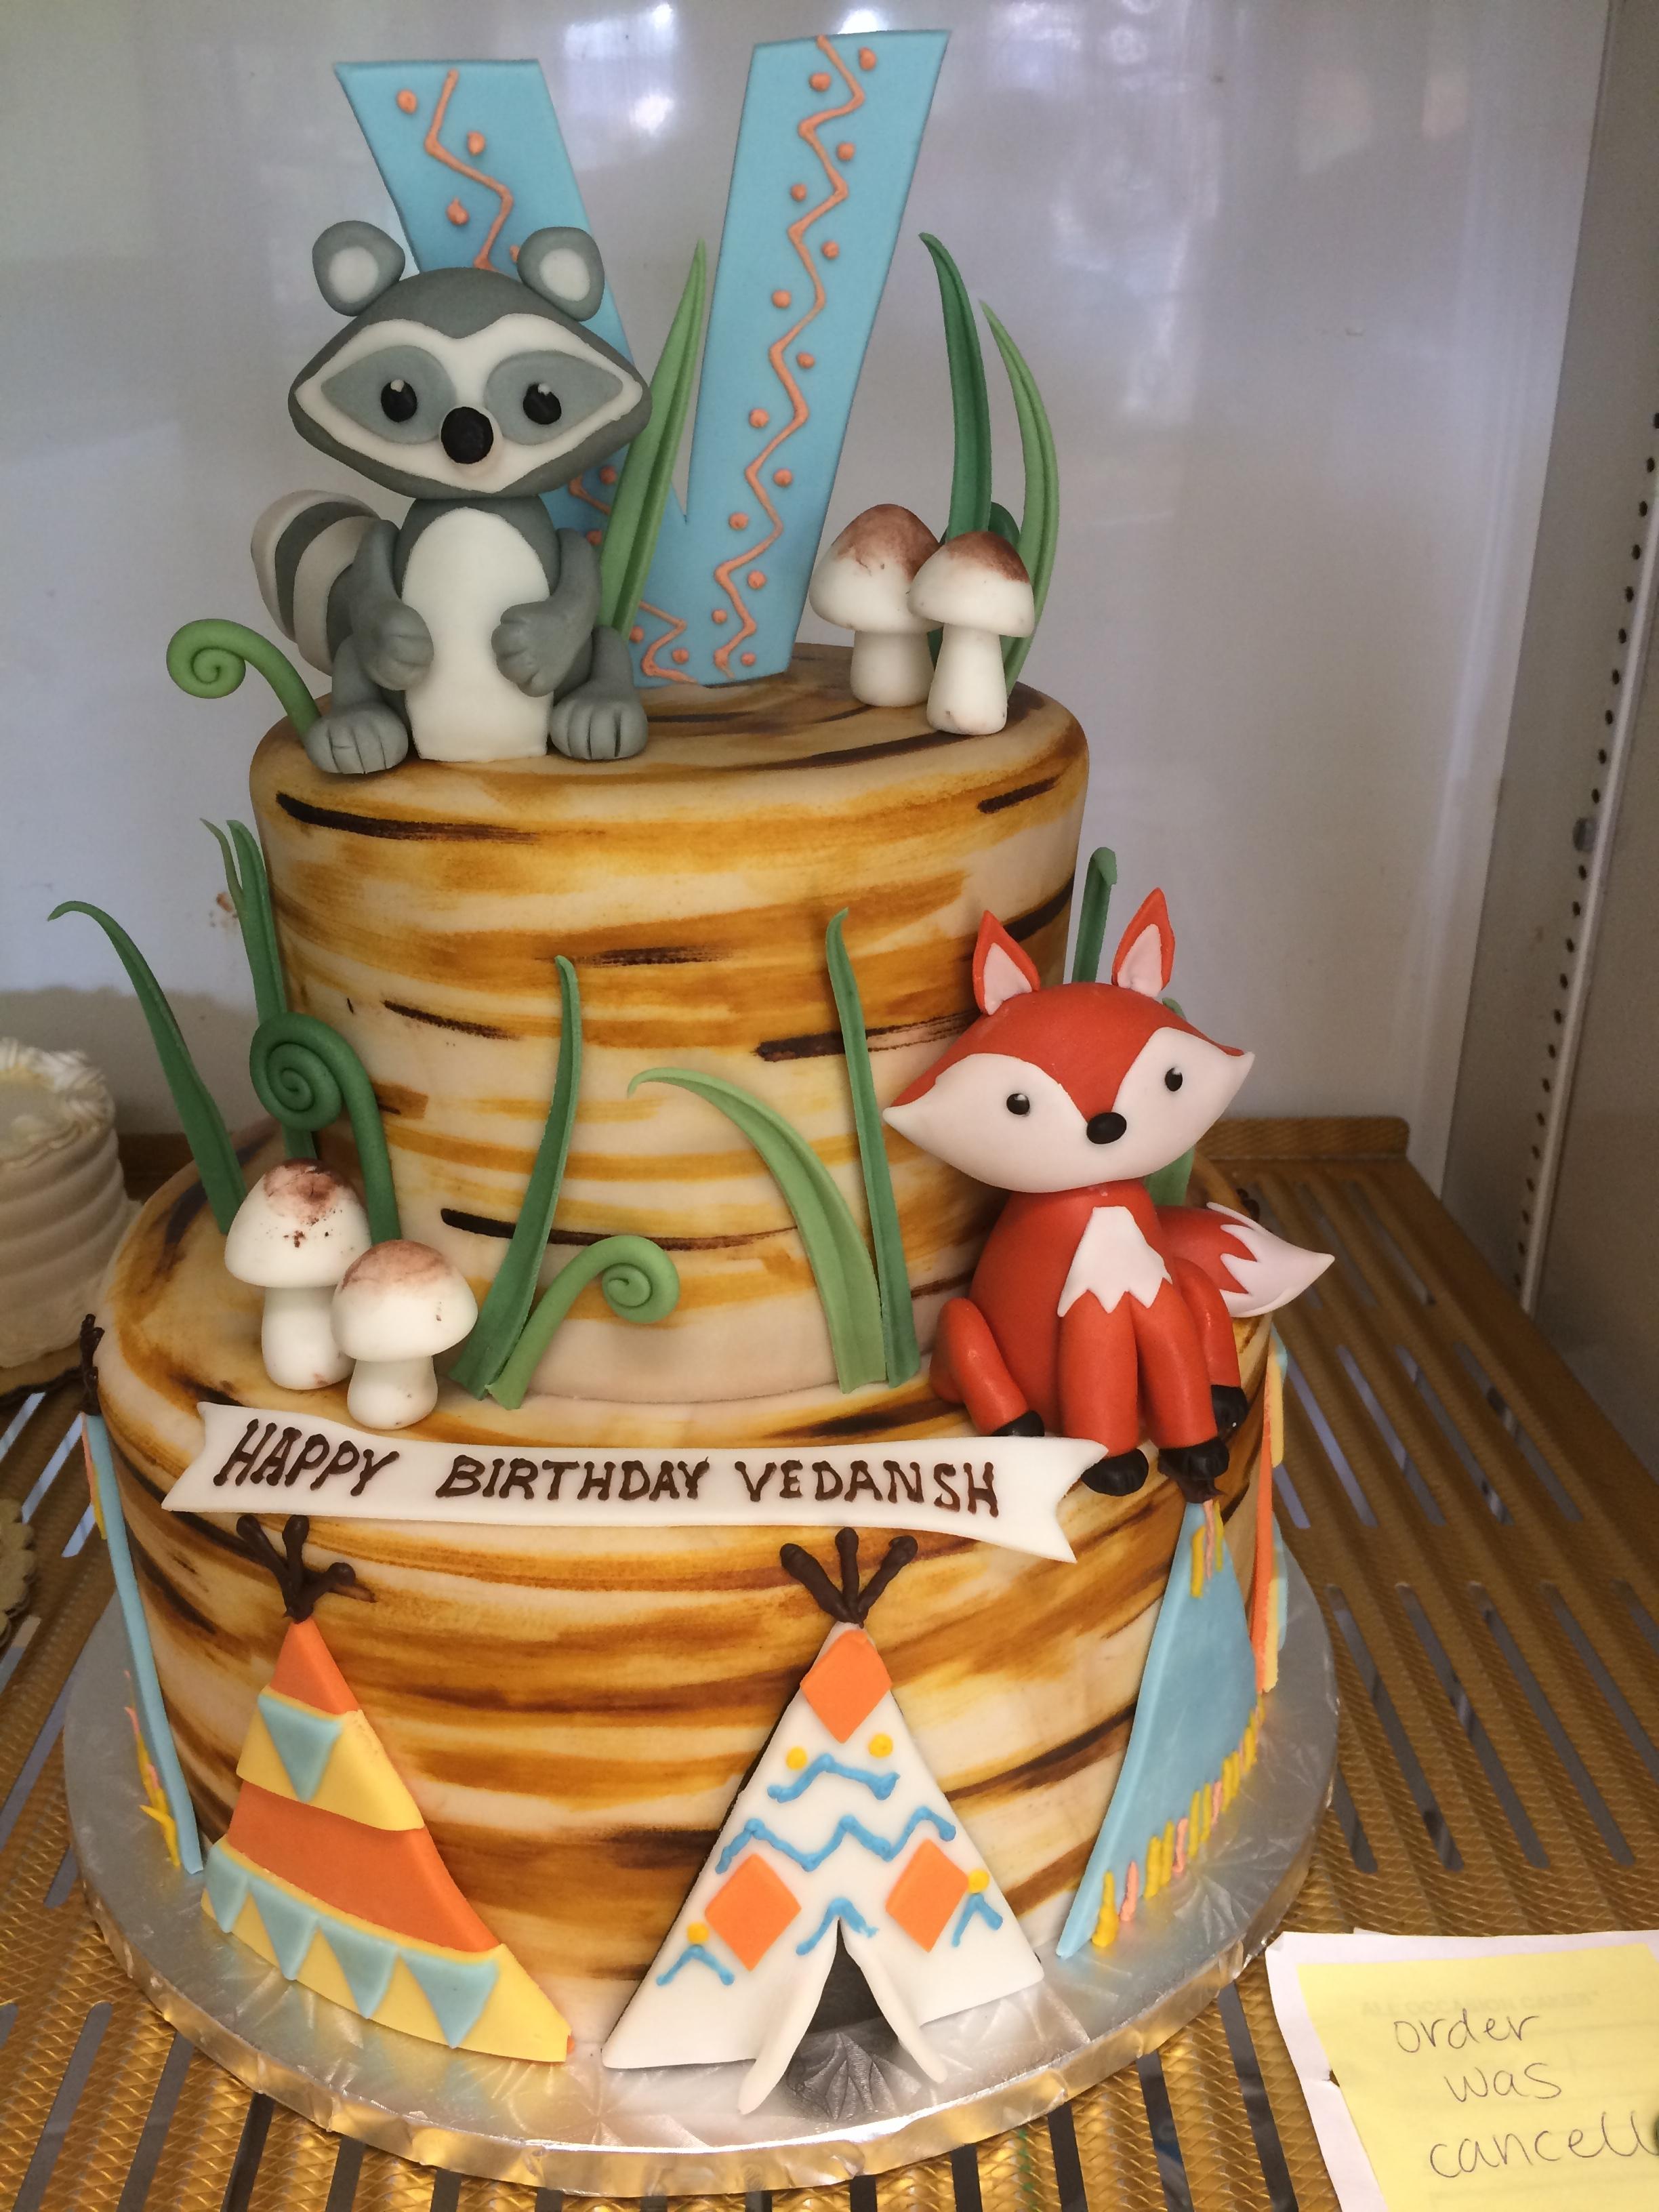 2986, birthday, woodland creatures, fox, raccoon, mushroom, mushrooms, animal, animals, grass, brown, green, figure, figures, tiered